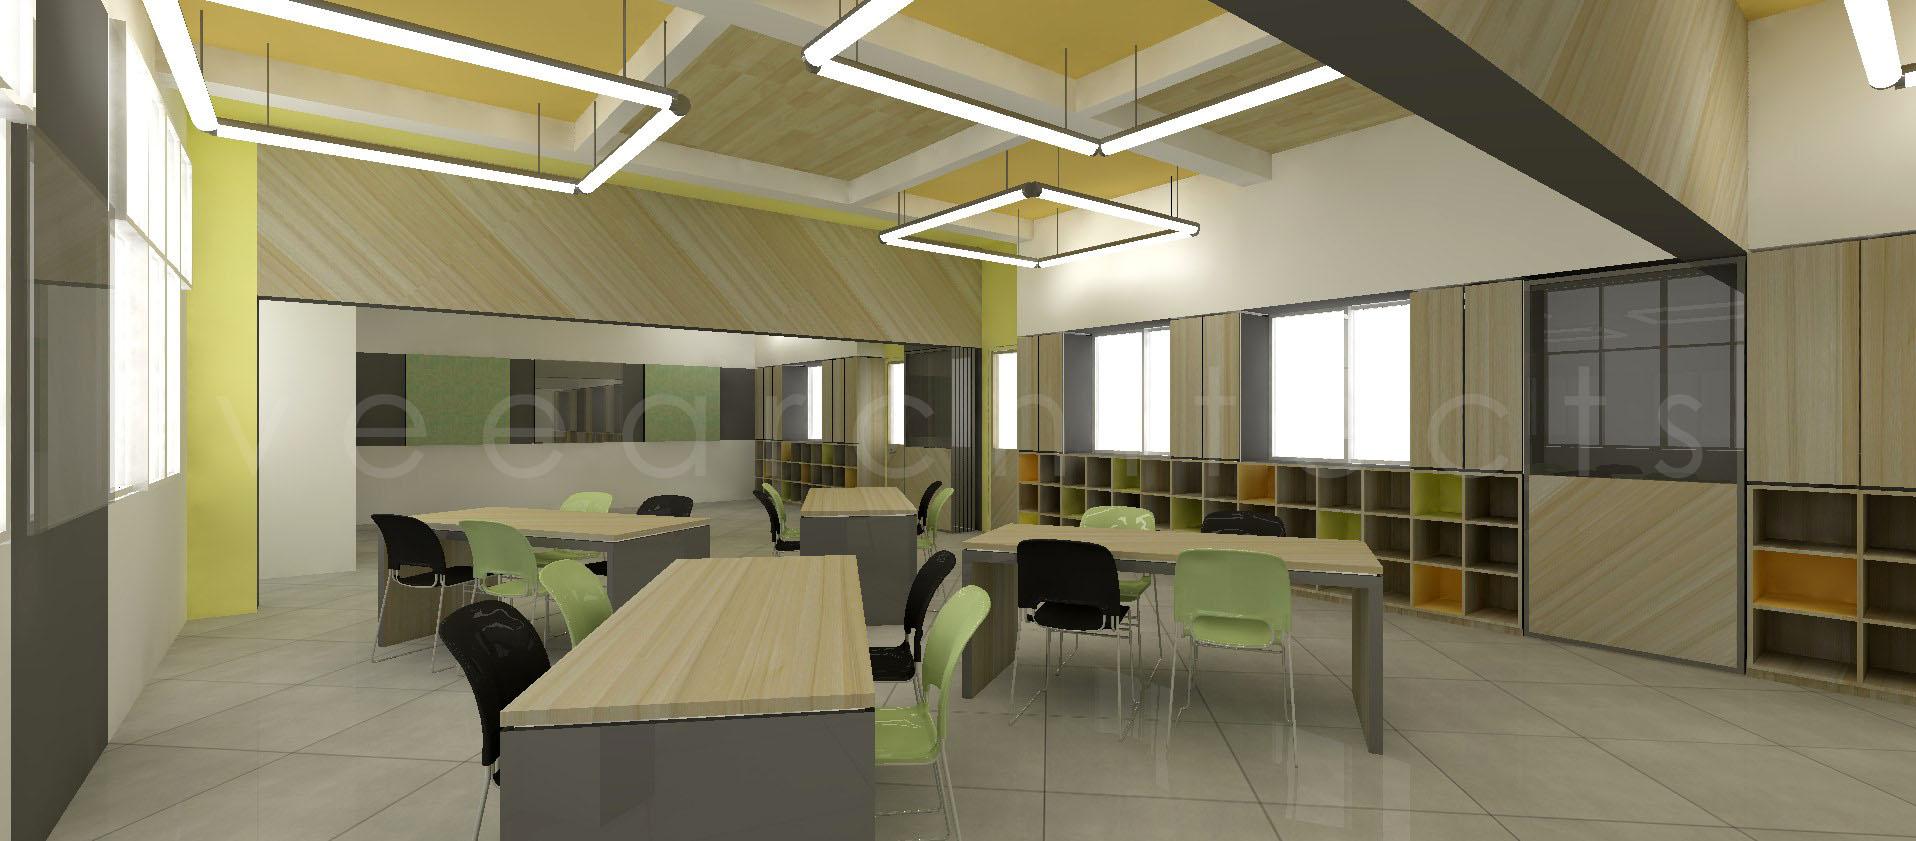 minds training centre @ ang mo kio